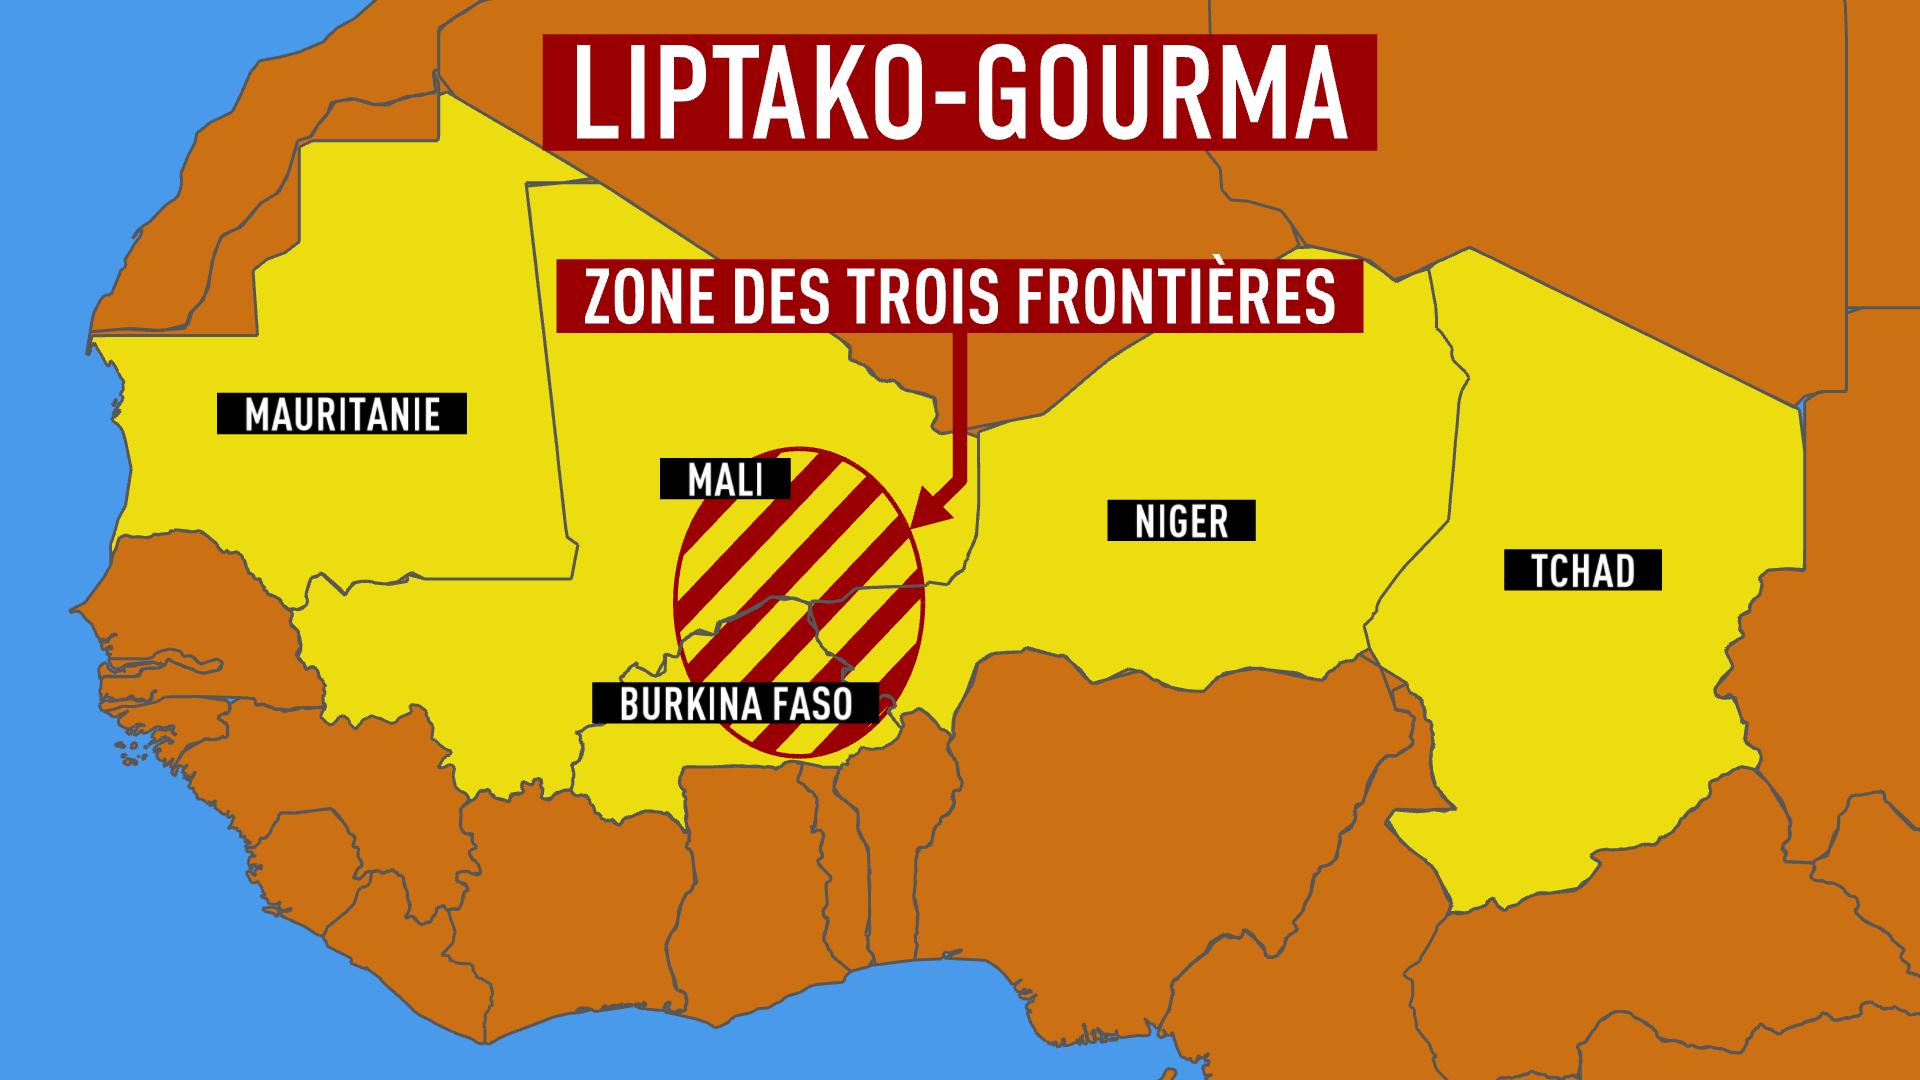 BARKHANE : STOP OU ENCORE ? Qui sont les djihadistes du Sahel que combat la France ?